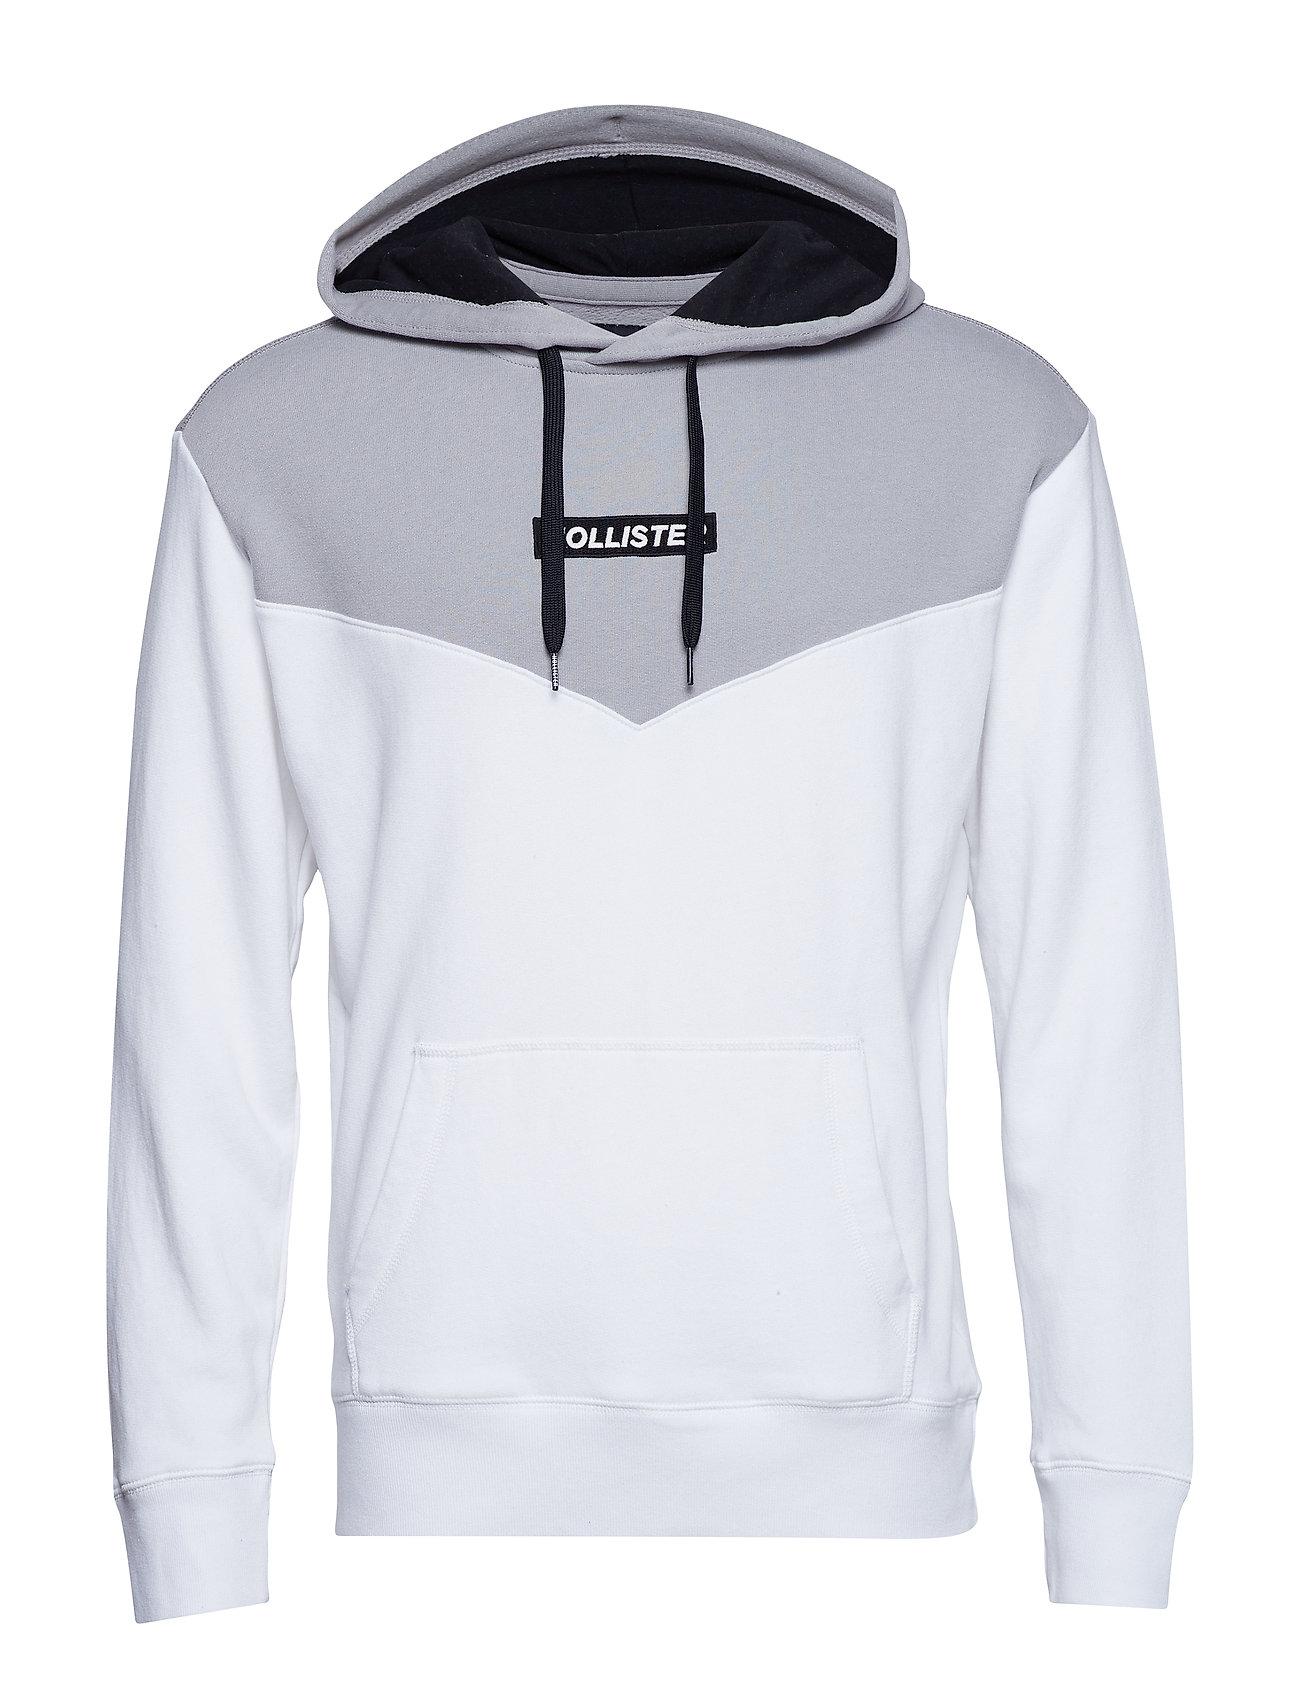 Hollister Logo Sweatshirt - WHITE